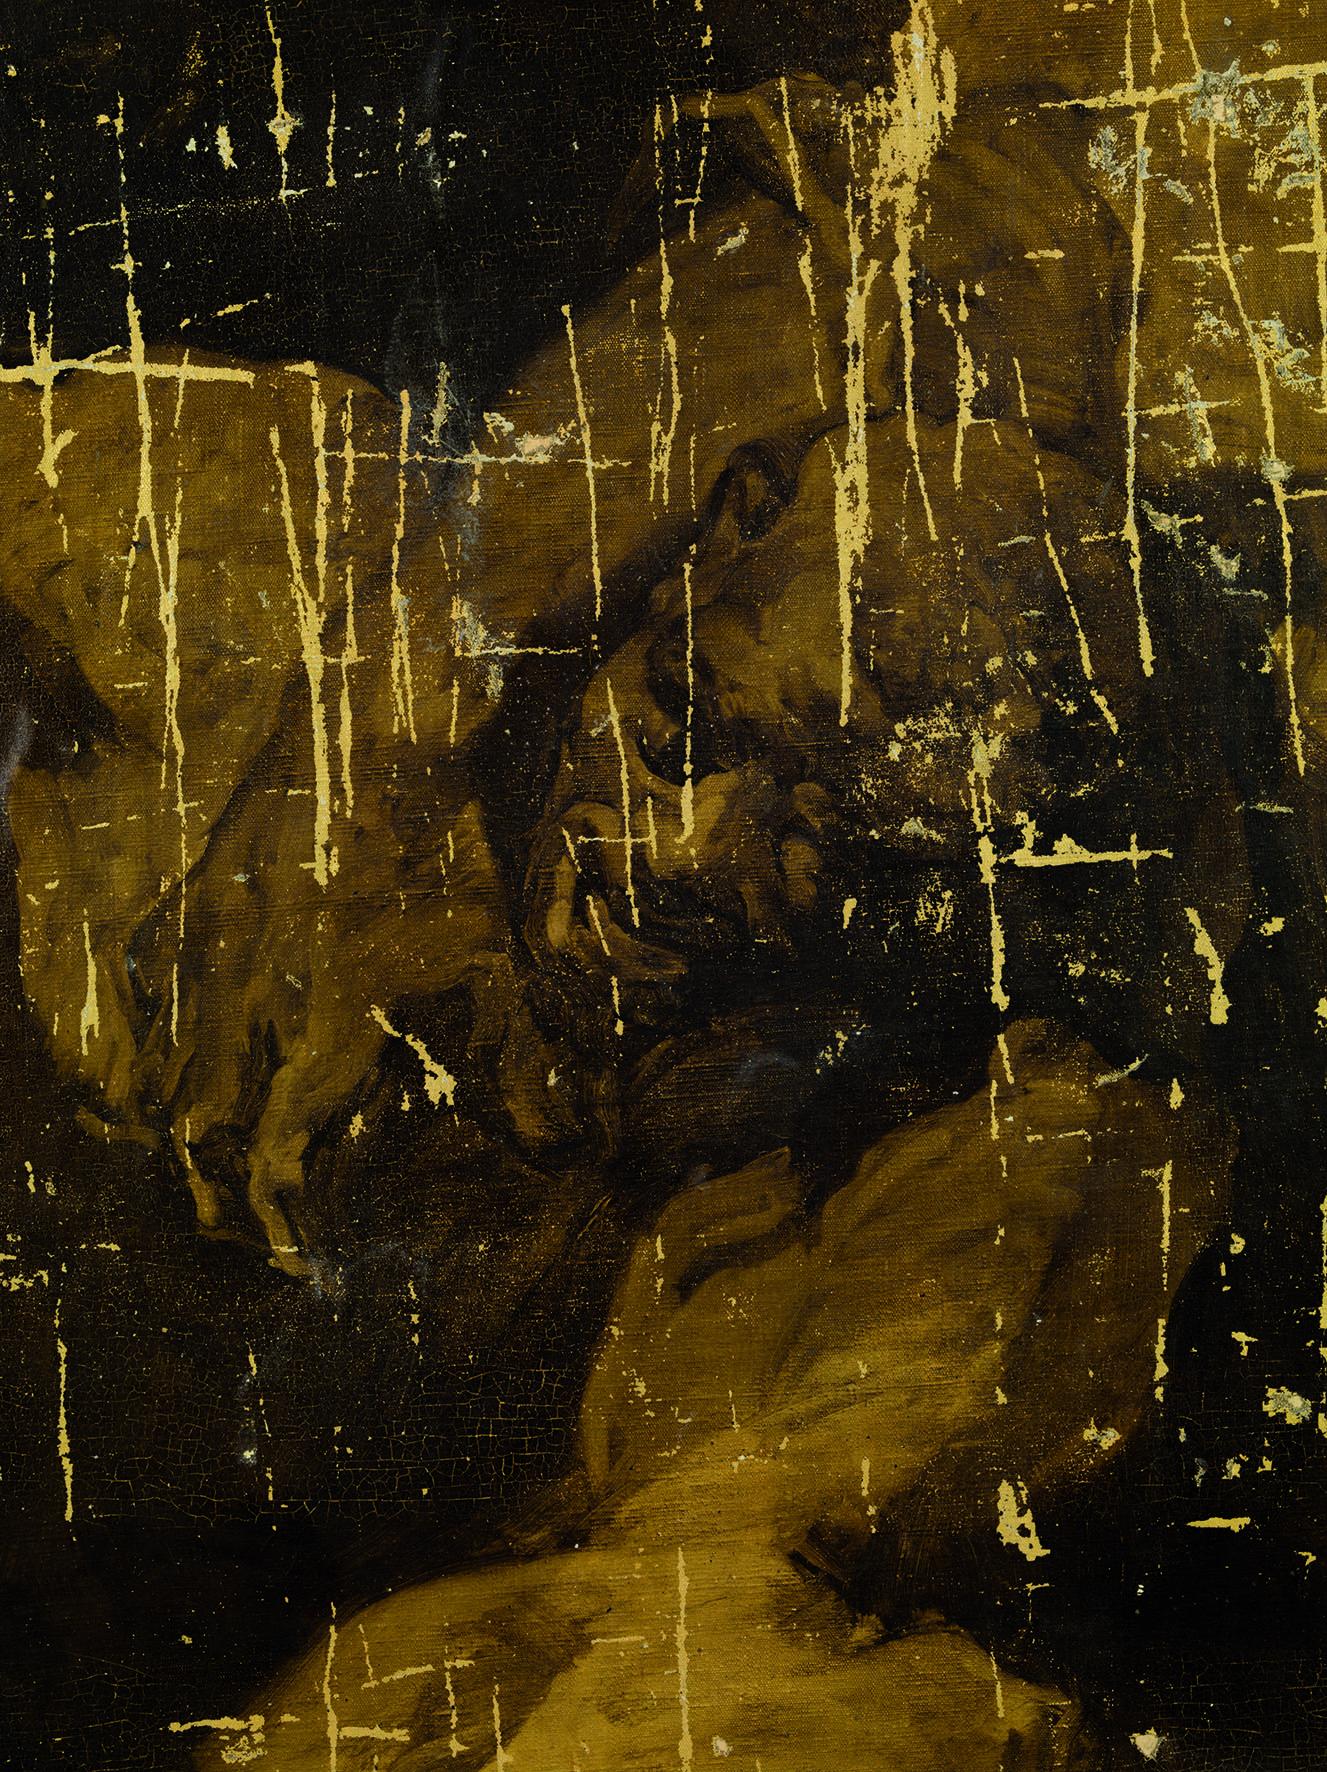 Josep Maria Sert, Fragmento deteriorado del Homenaje al Oriente, Catedral de Vic, 1926-1927. © Museu Nacional d'art de Catalunya. Foto: Ferran Gimenez